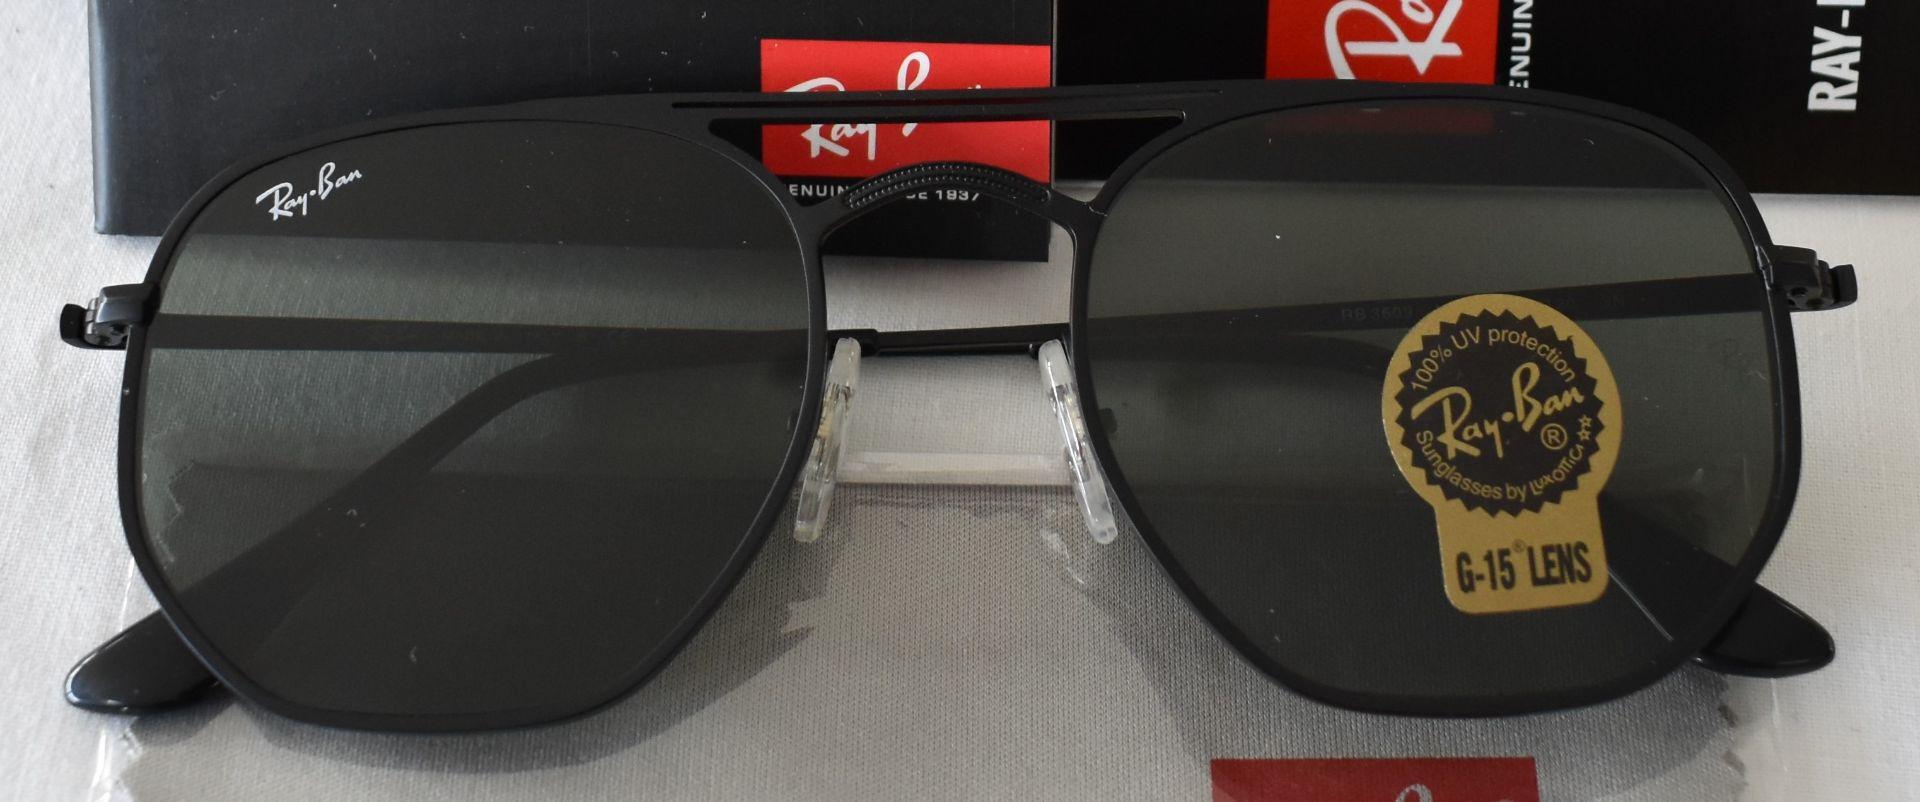 Ray Ban Sunglasses ORB3609N 148/11 *3N - Image 2 of 3